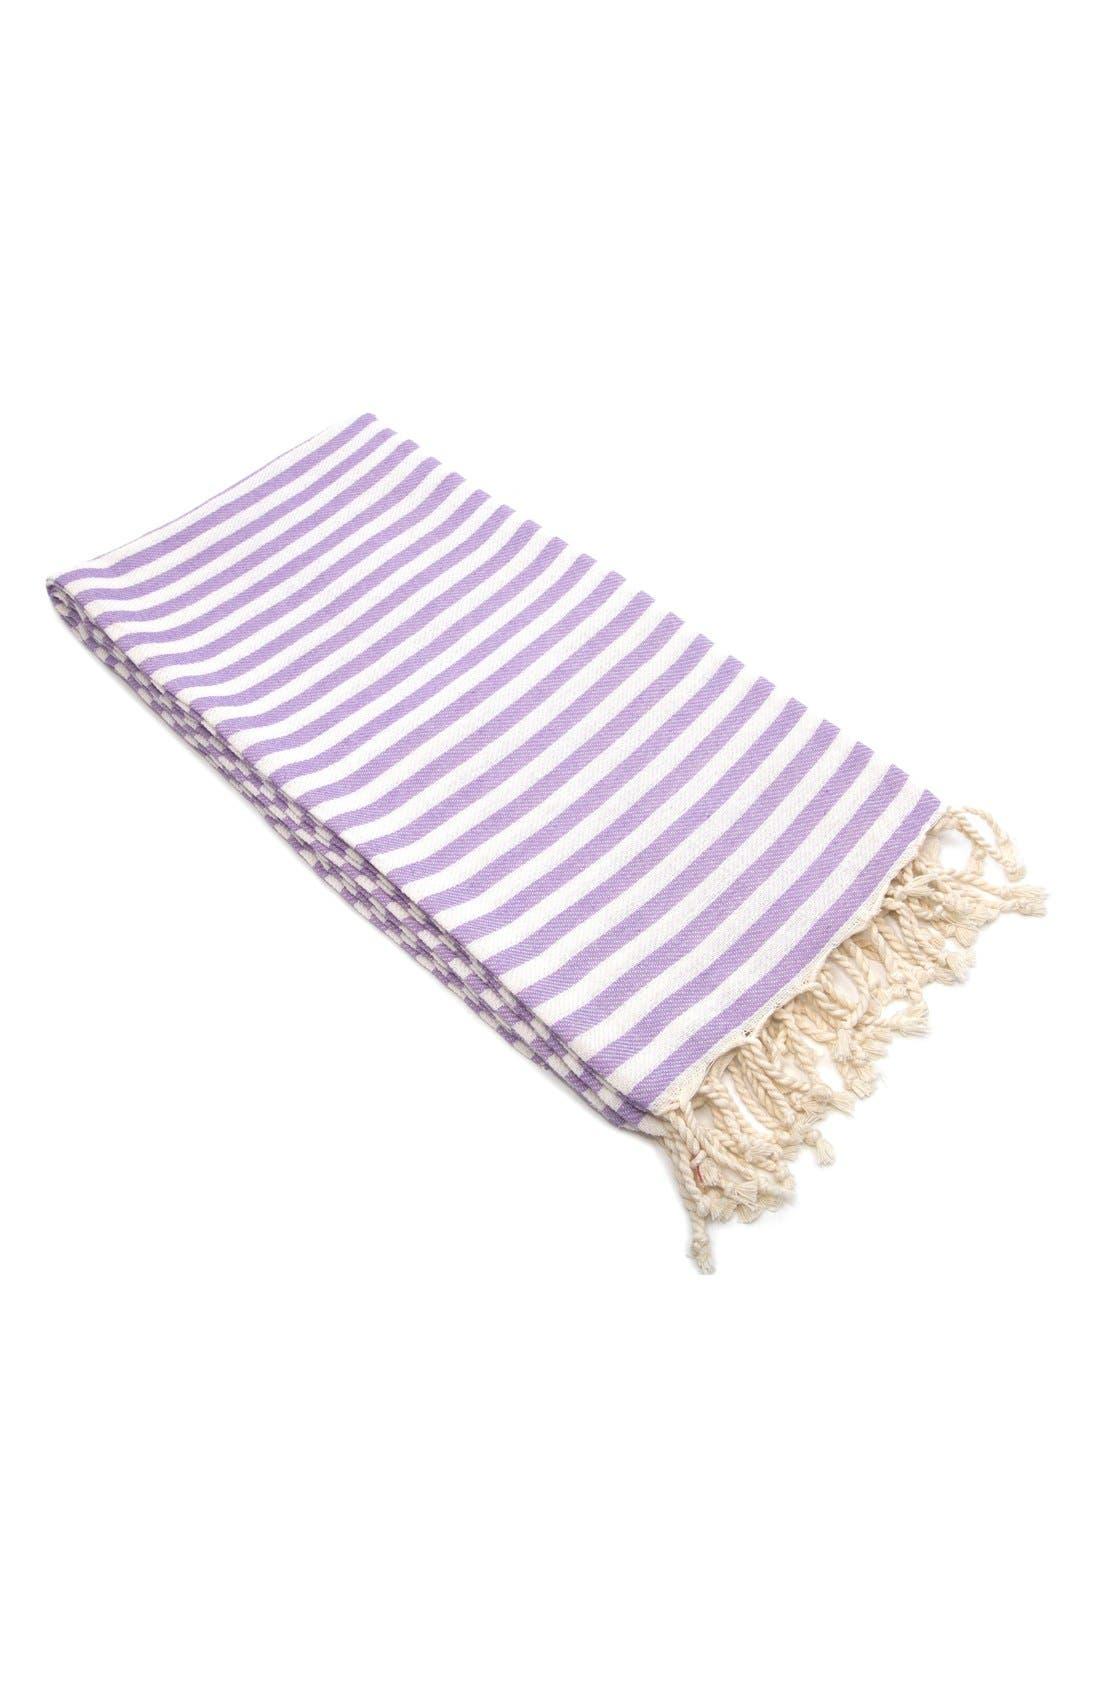 'Fun in the Sun' Turkish Pestemal Towel,                             Main thumbnail 1, color,                             Lilac